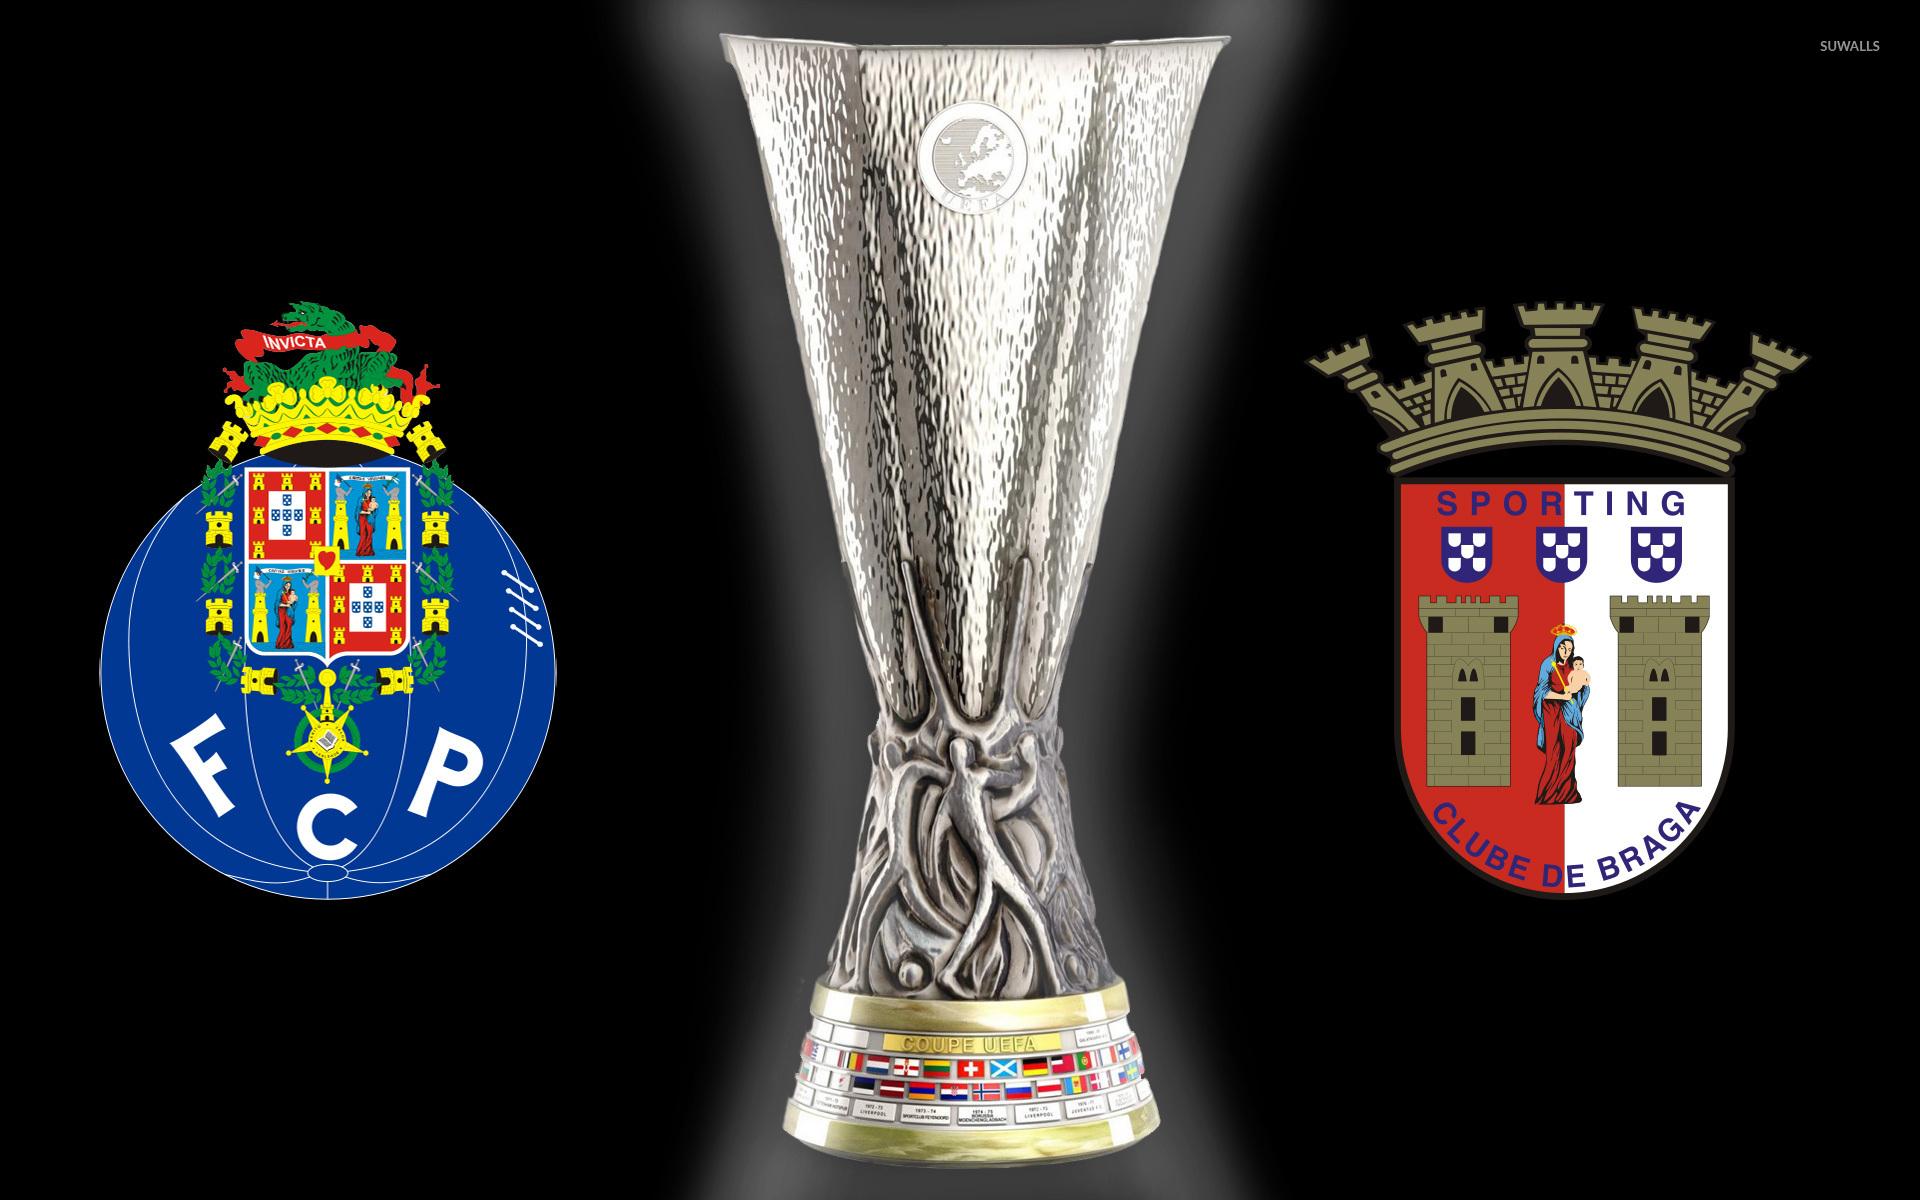 Uefa Europa Picture: Uefa Europa League Final Wallpaper